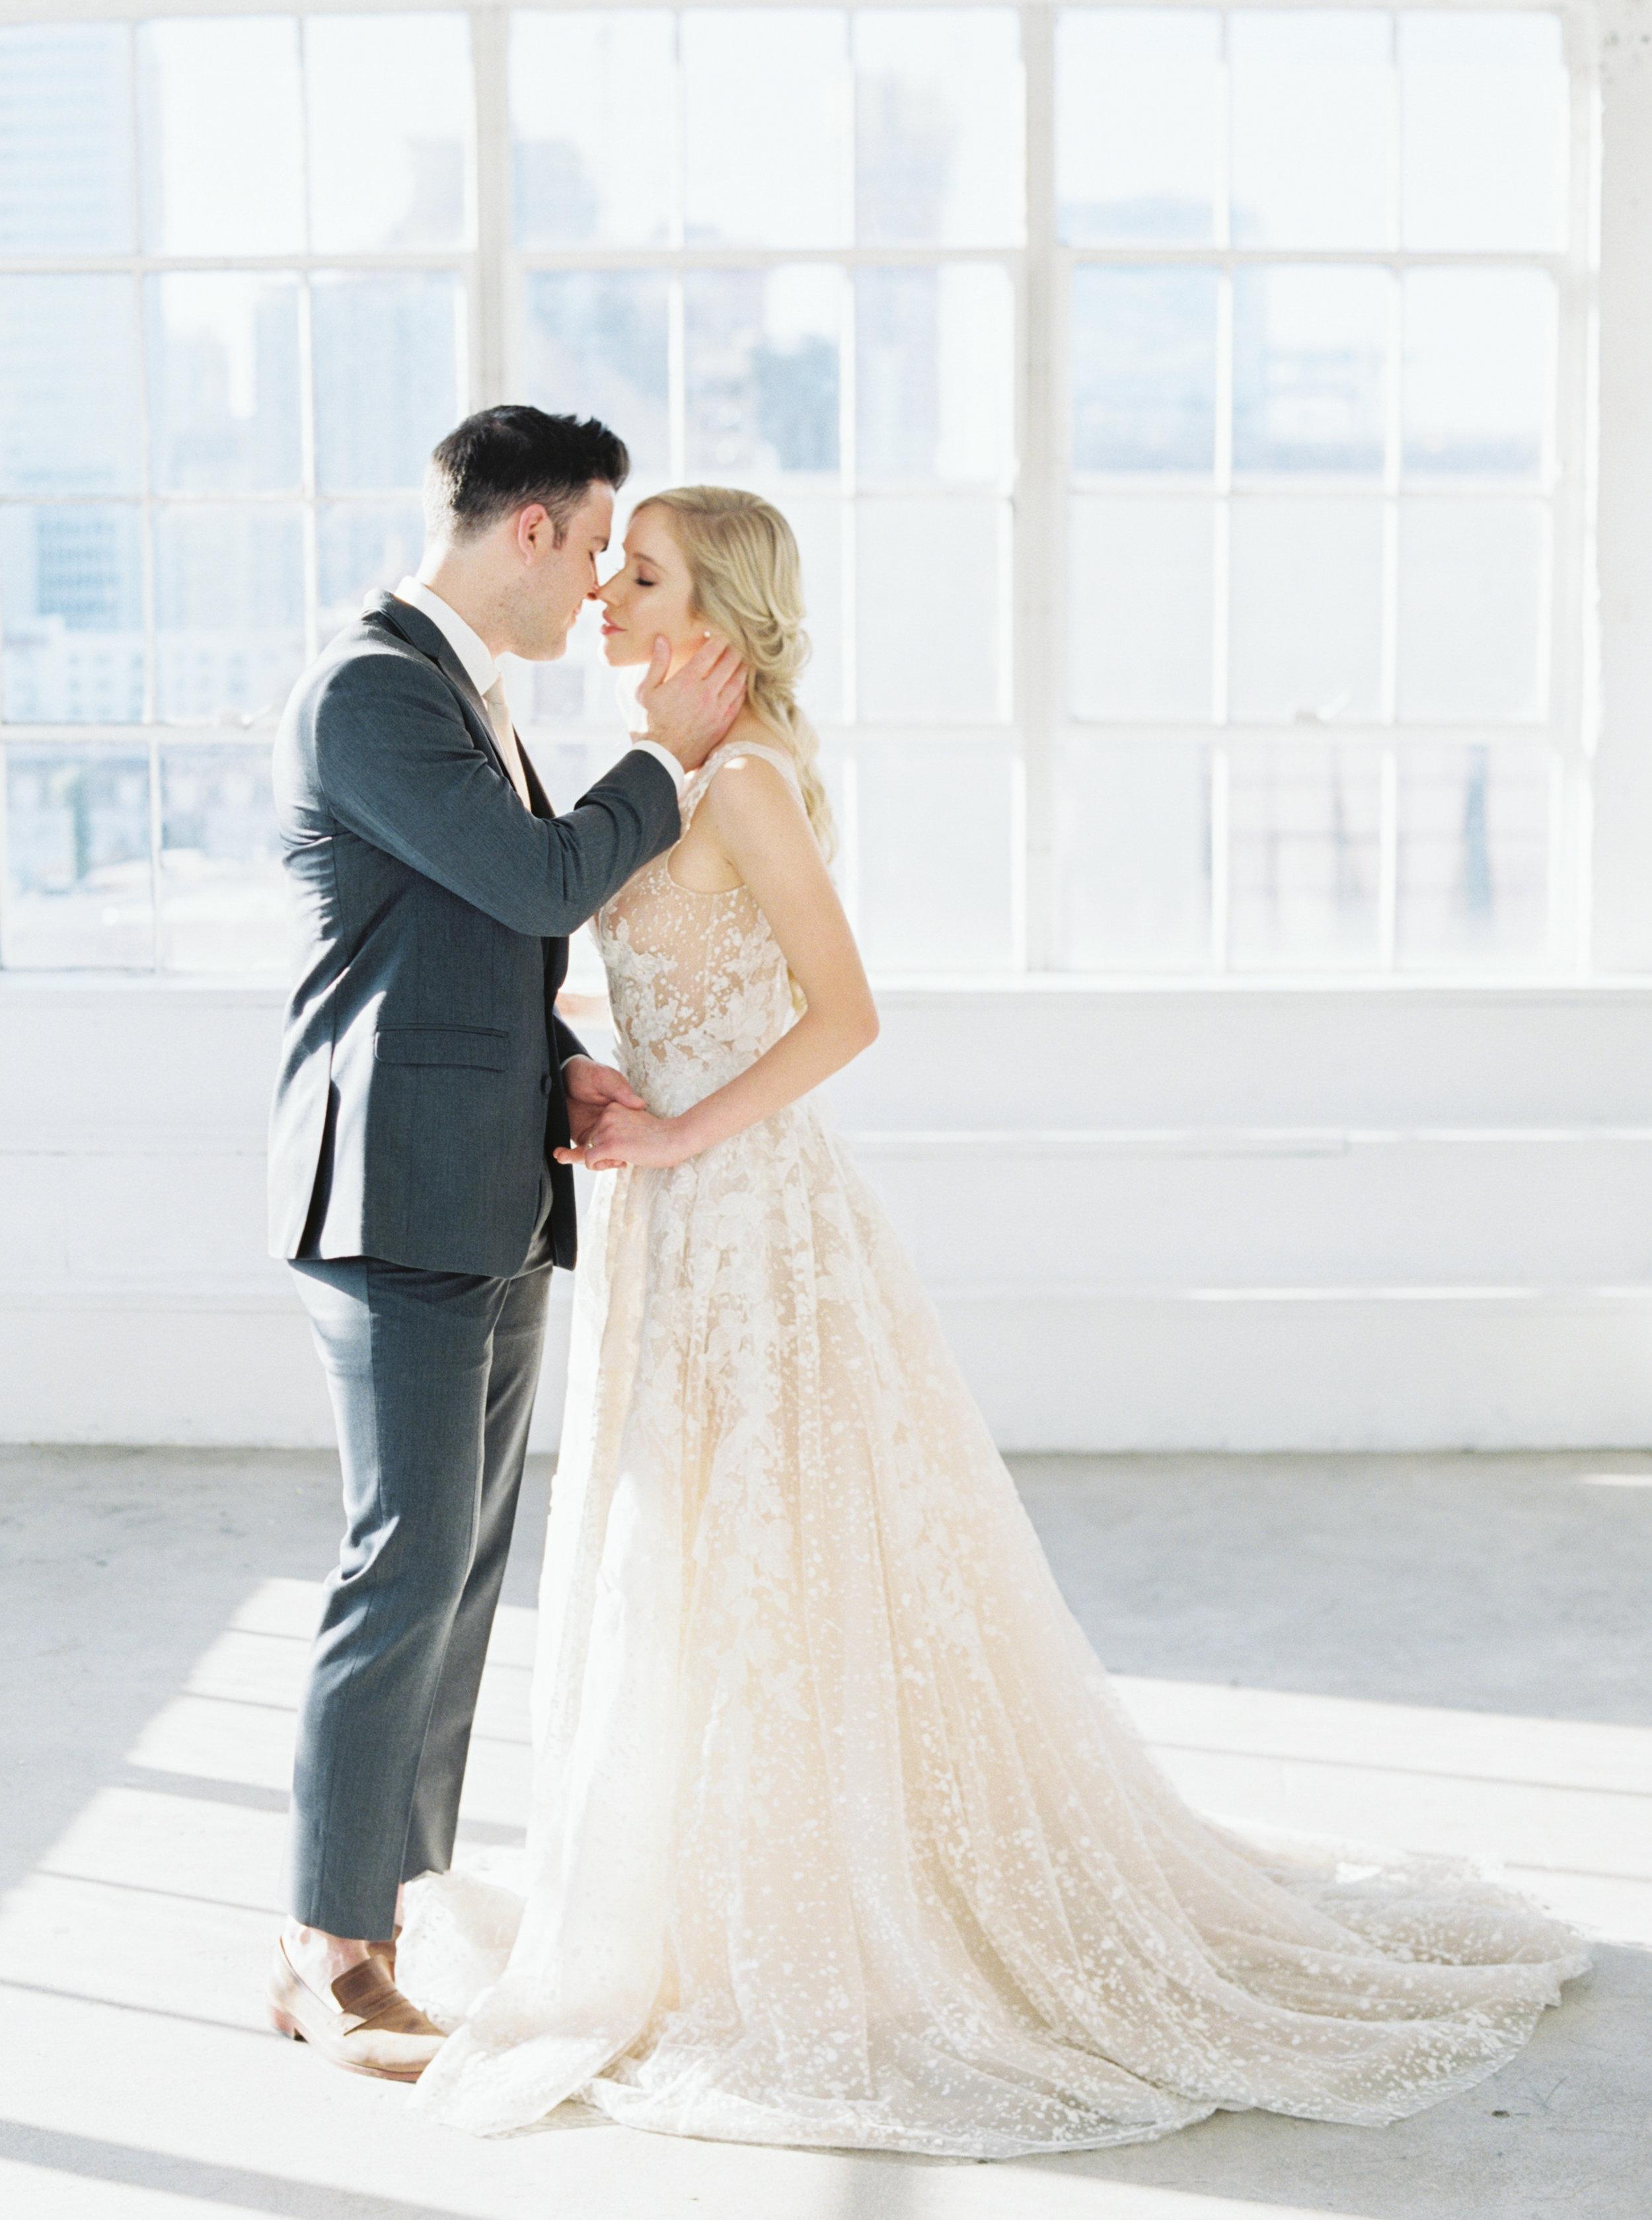 The Wedding Day Workshop - Editorial